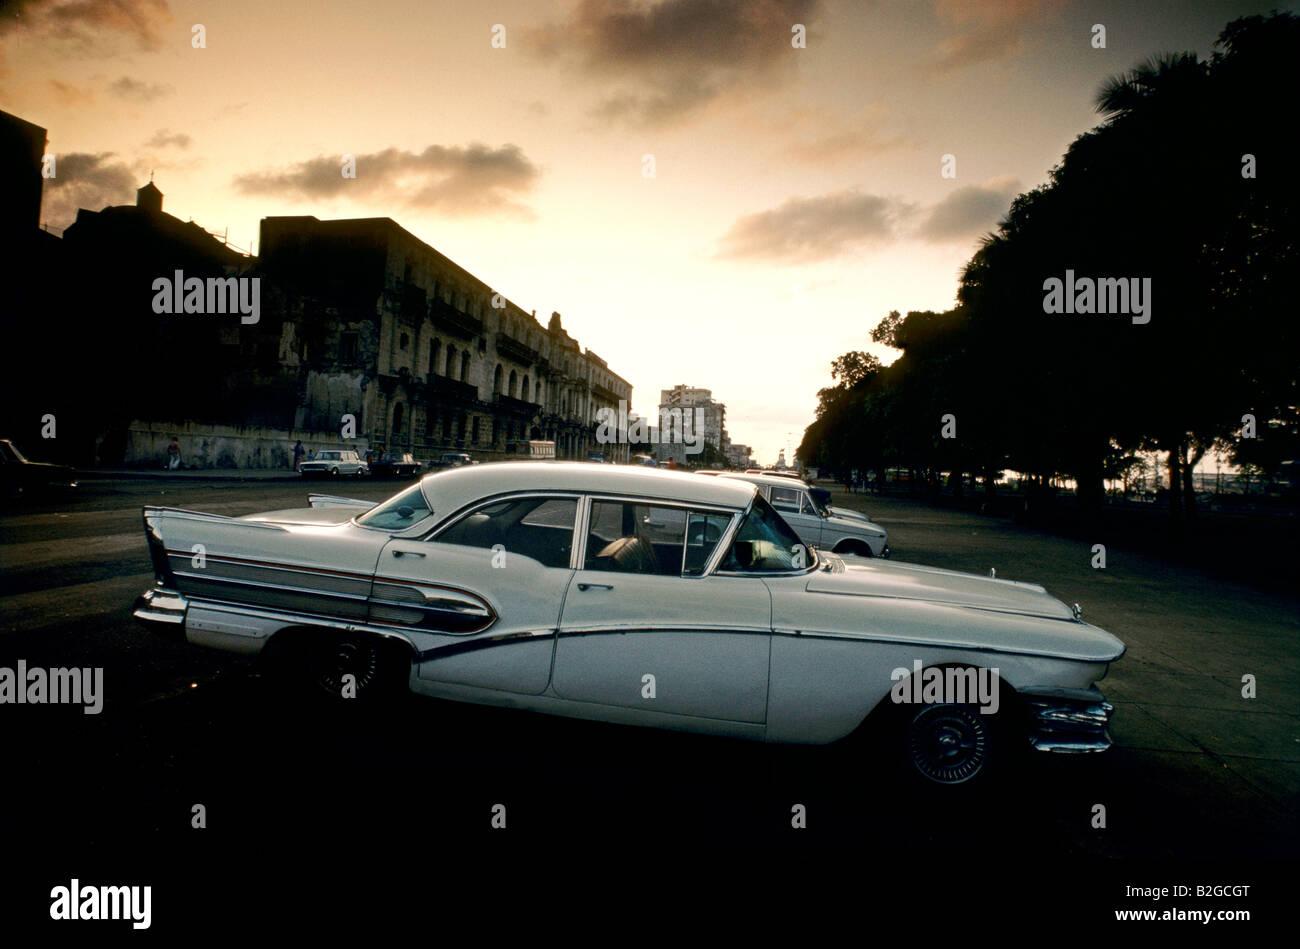 White classic American car at sunset, Havana, Cuba - Stock Image